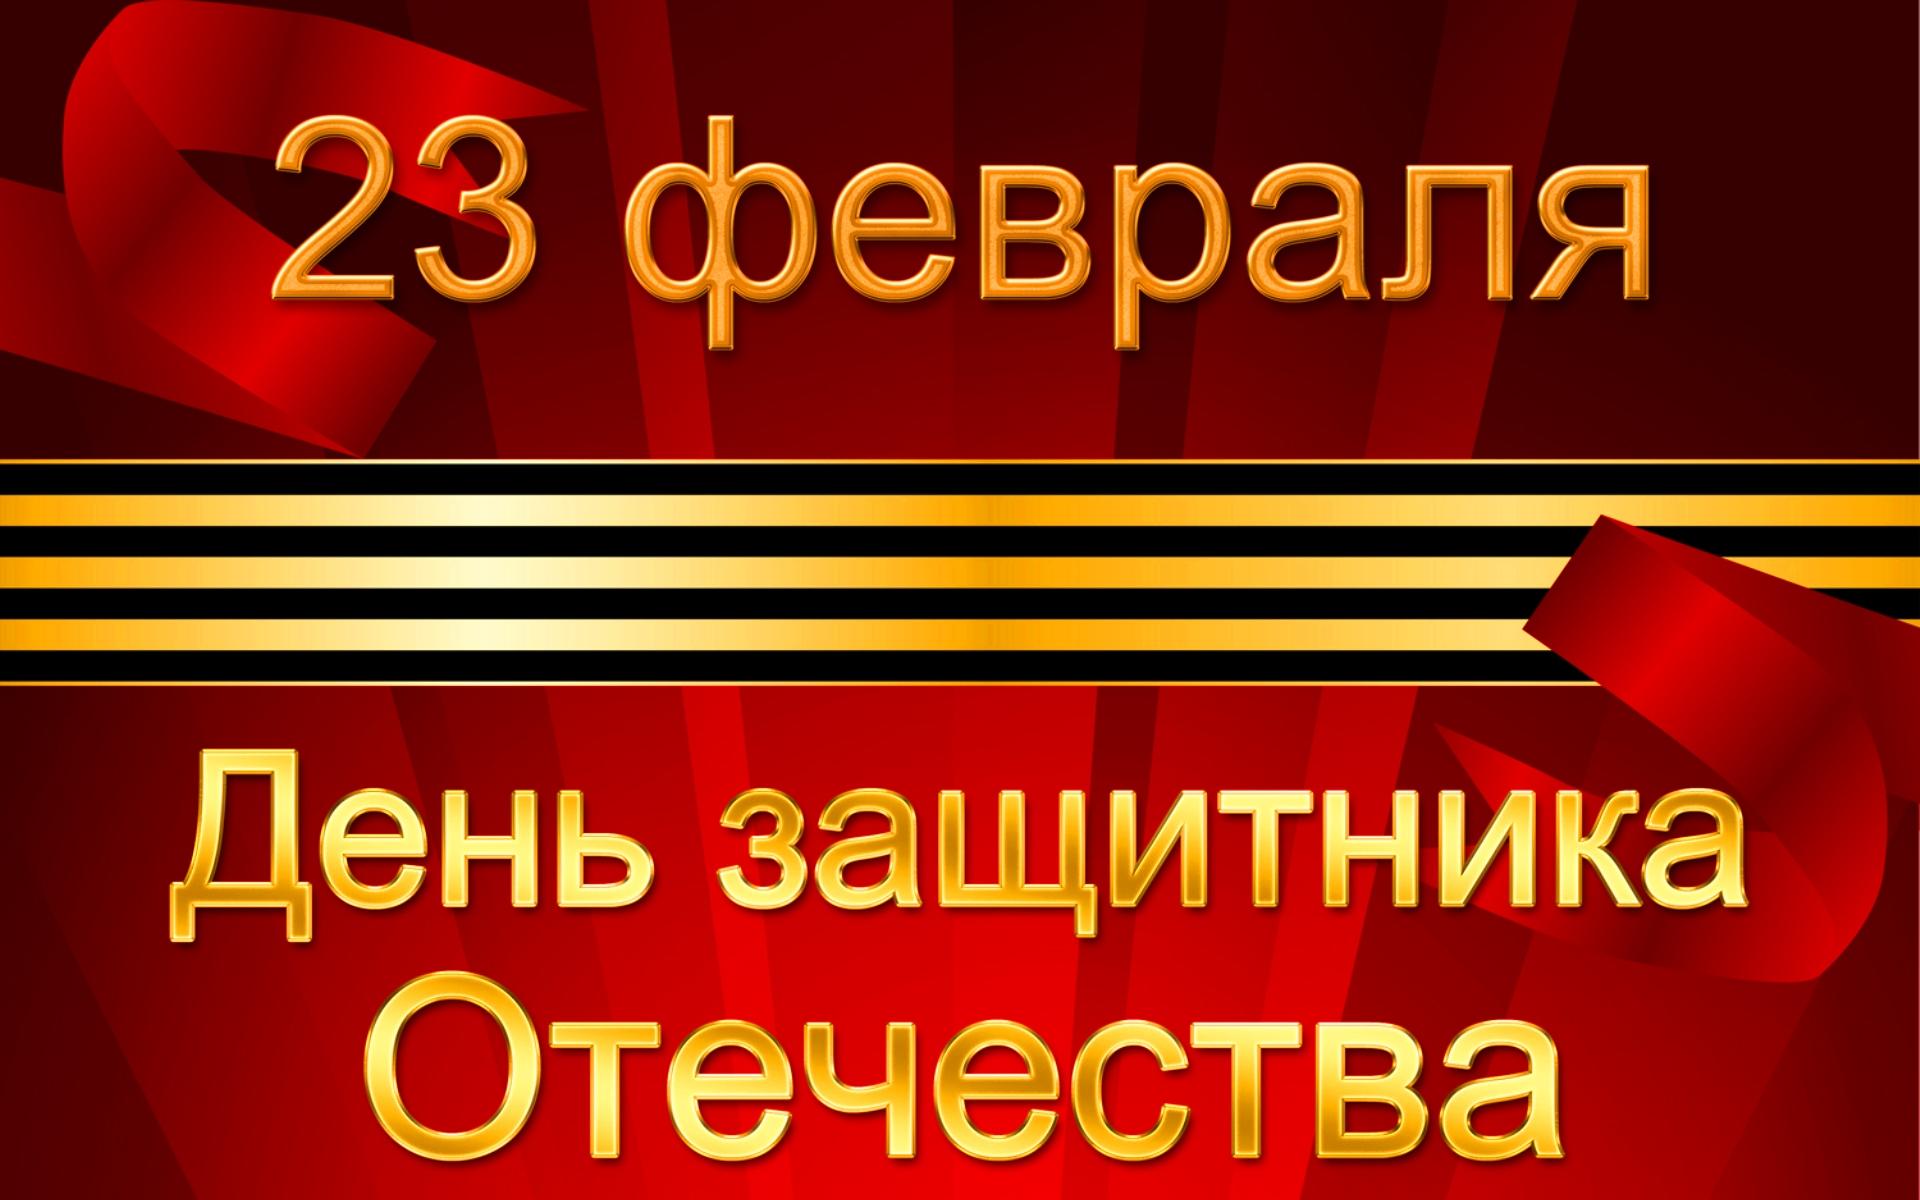 http://www.kartinki24.ru/uploads/gallery/main/204/kartinki24_ru_februaru_23_34.jpg